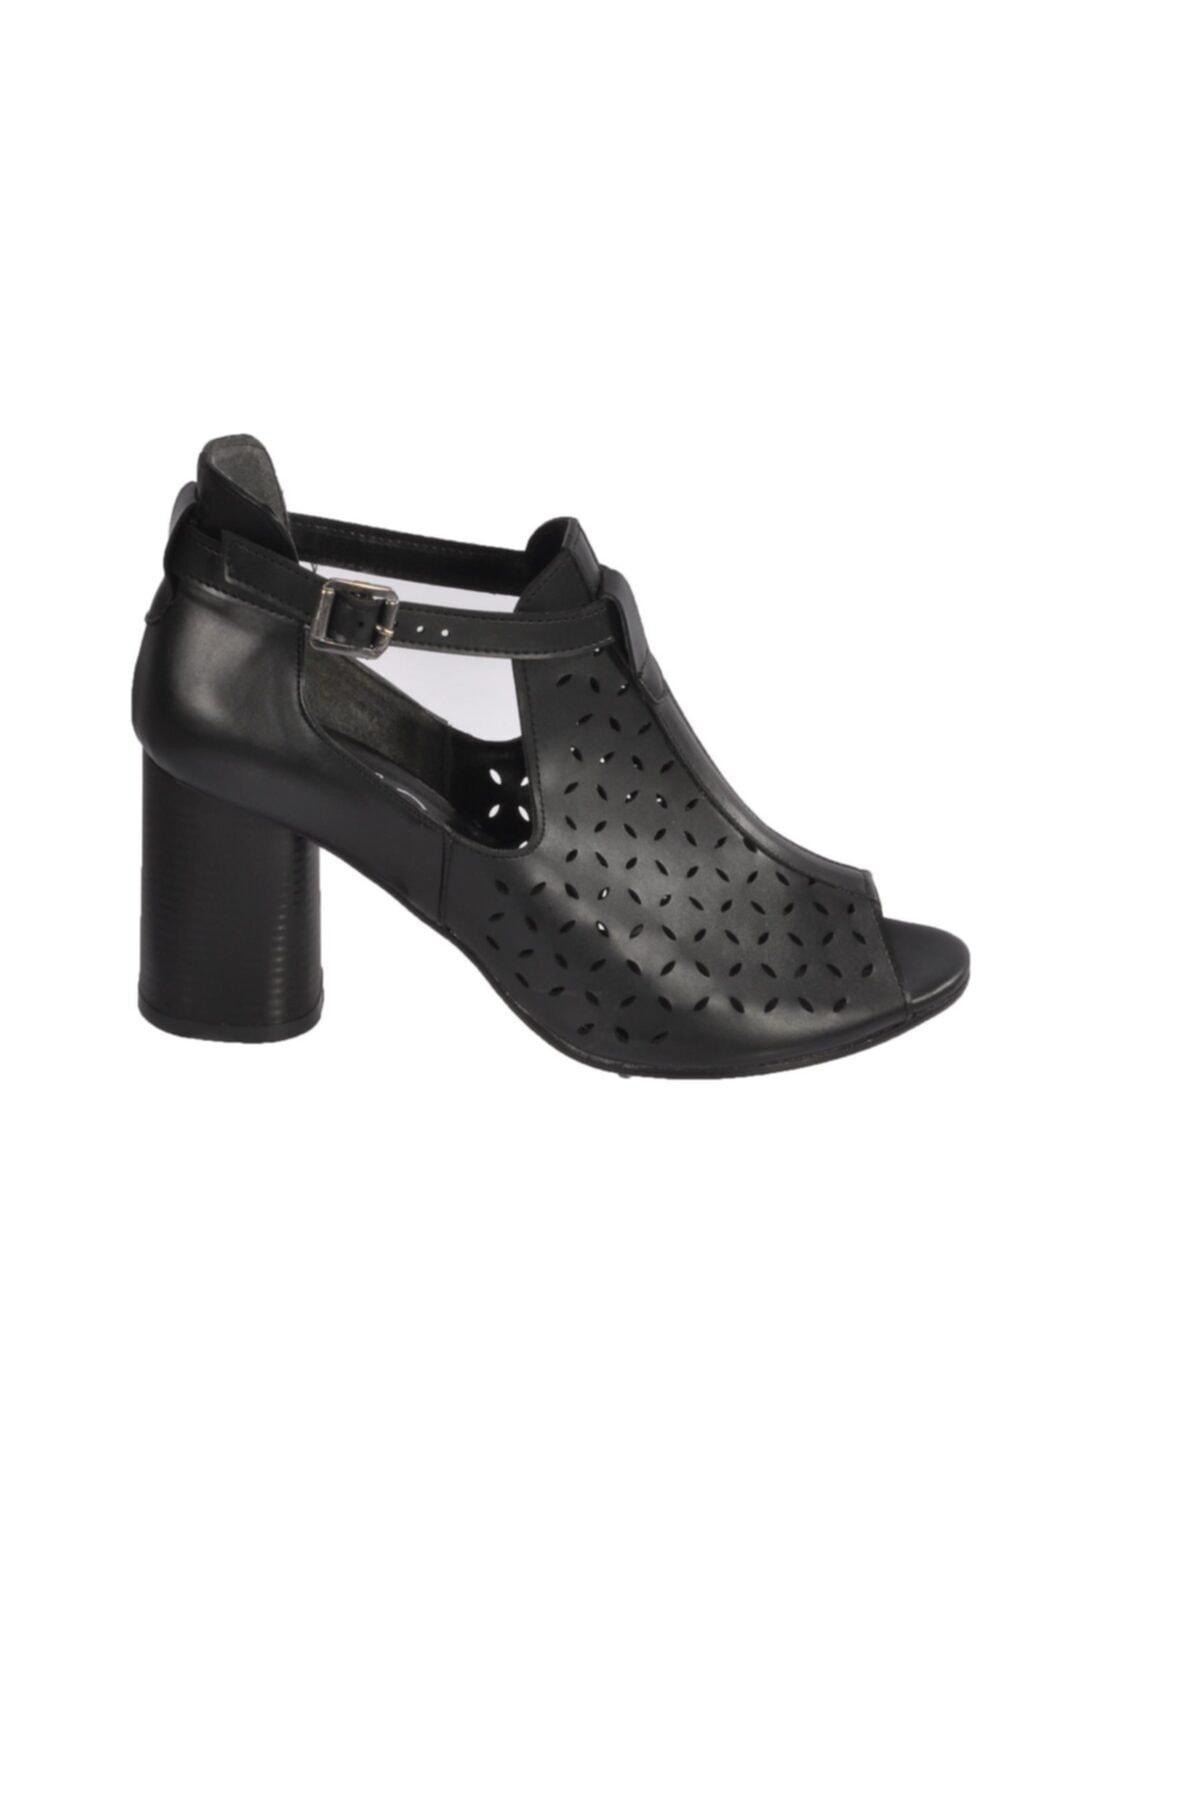 Maje Kadın  Siyah Topuklu Ayakkabı 2